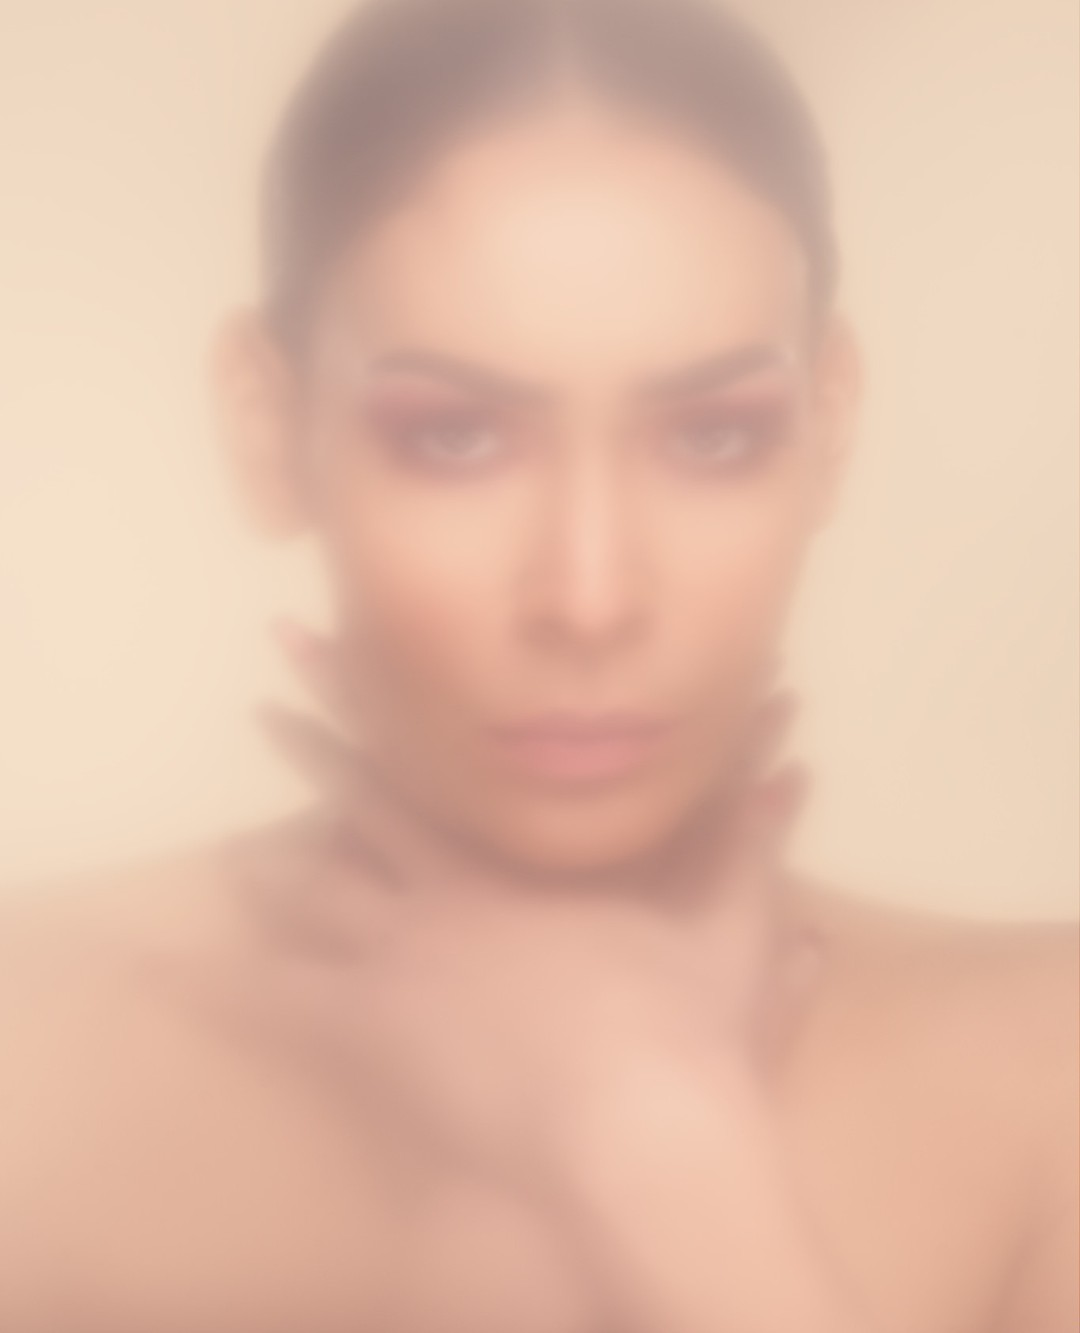 nikon profoto beautyphotography fineart femalepower stateoftheworld fierce beauty quiet